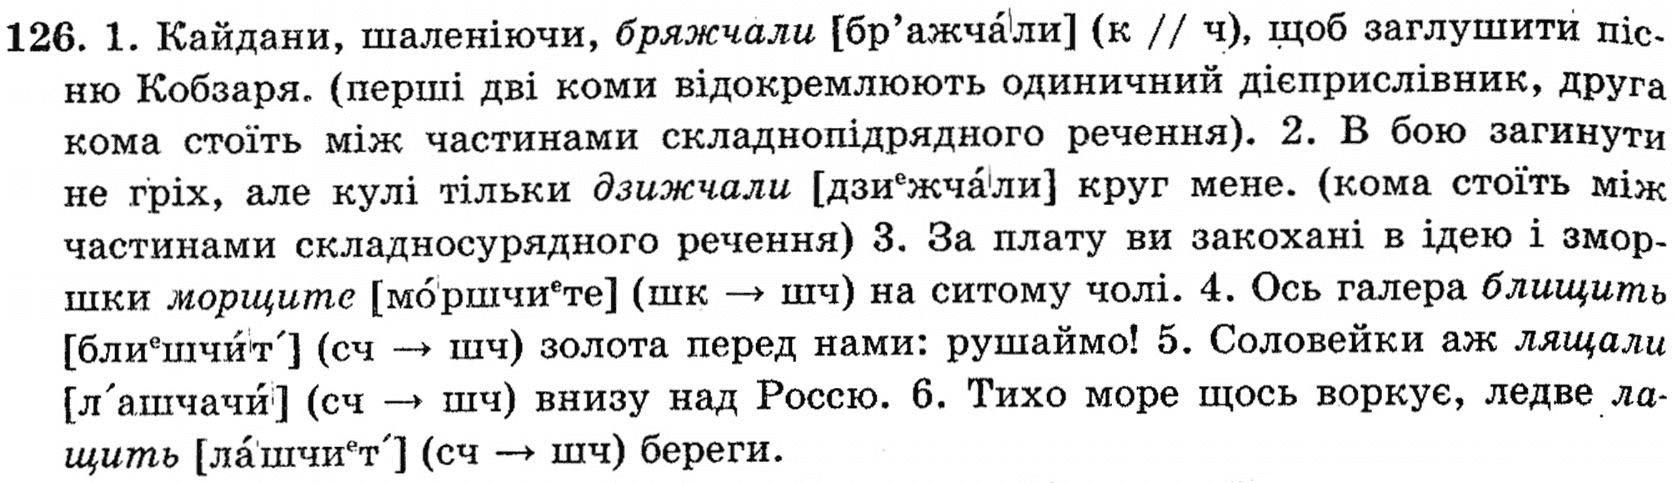 Українському решебник язику по